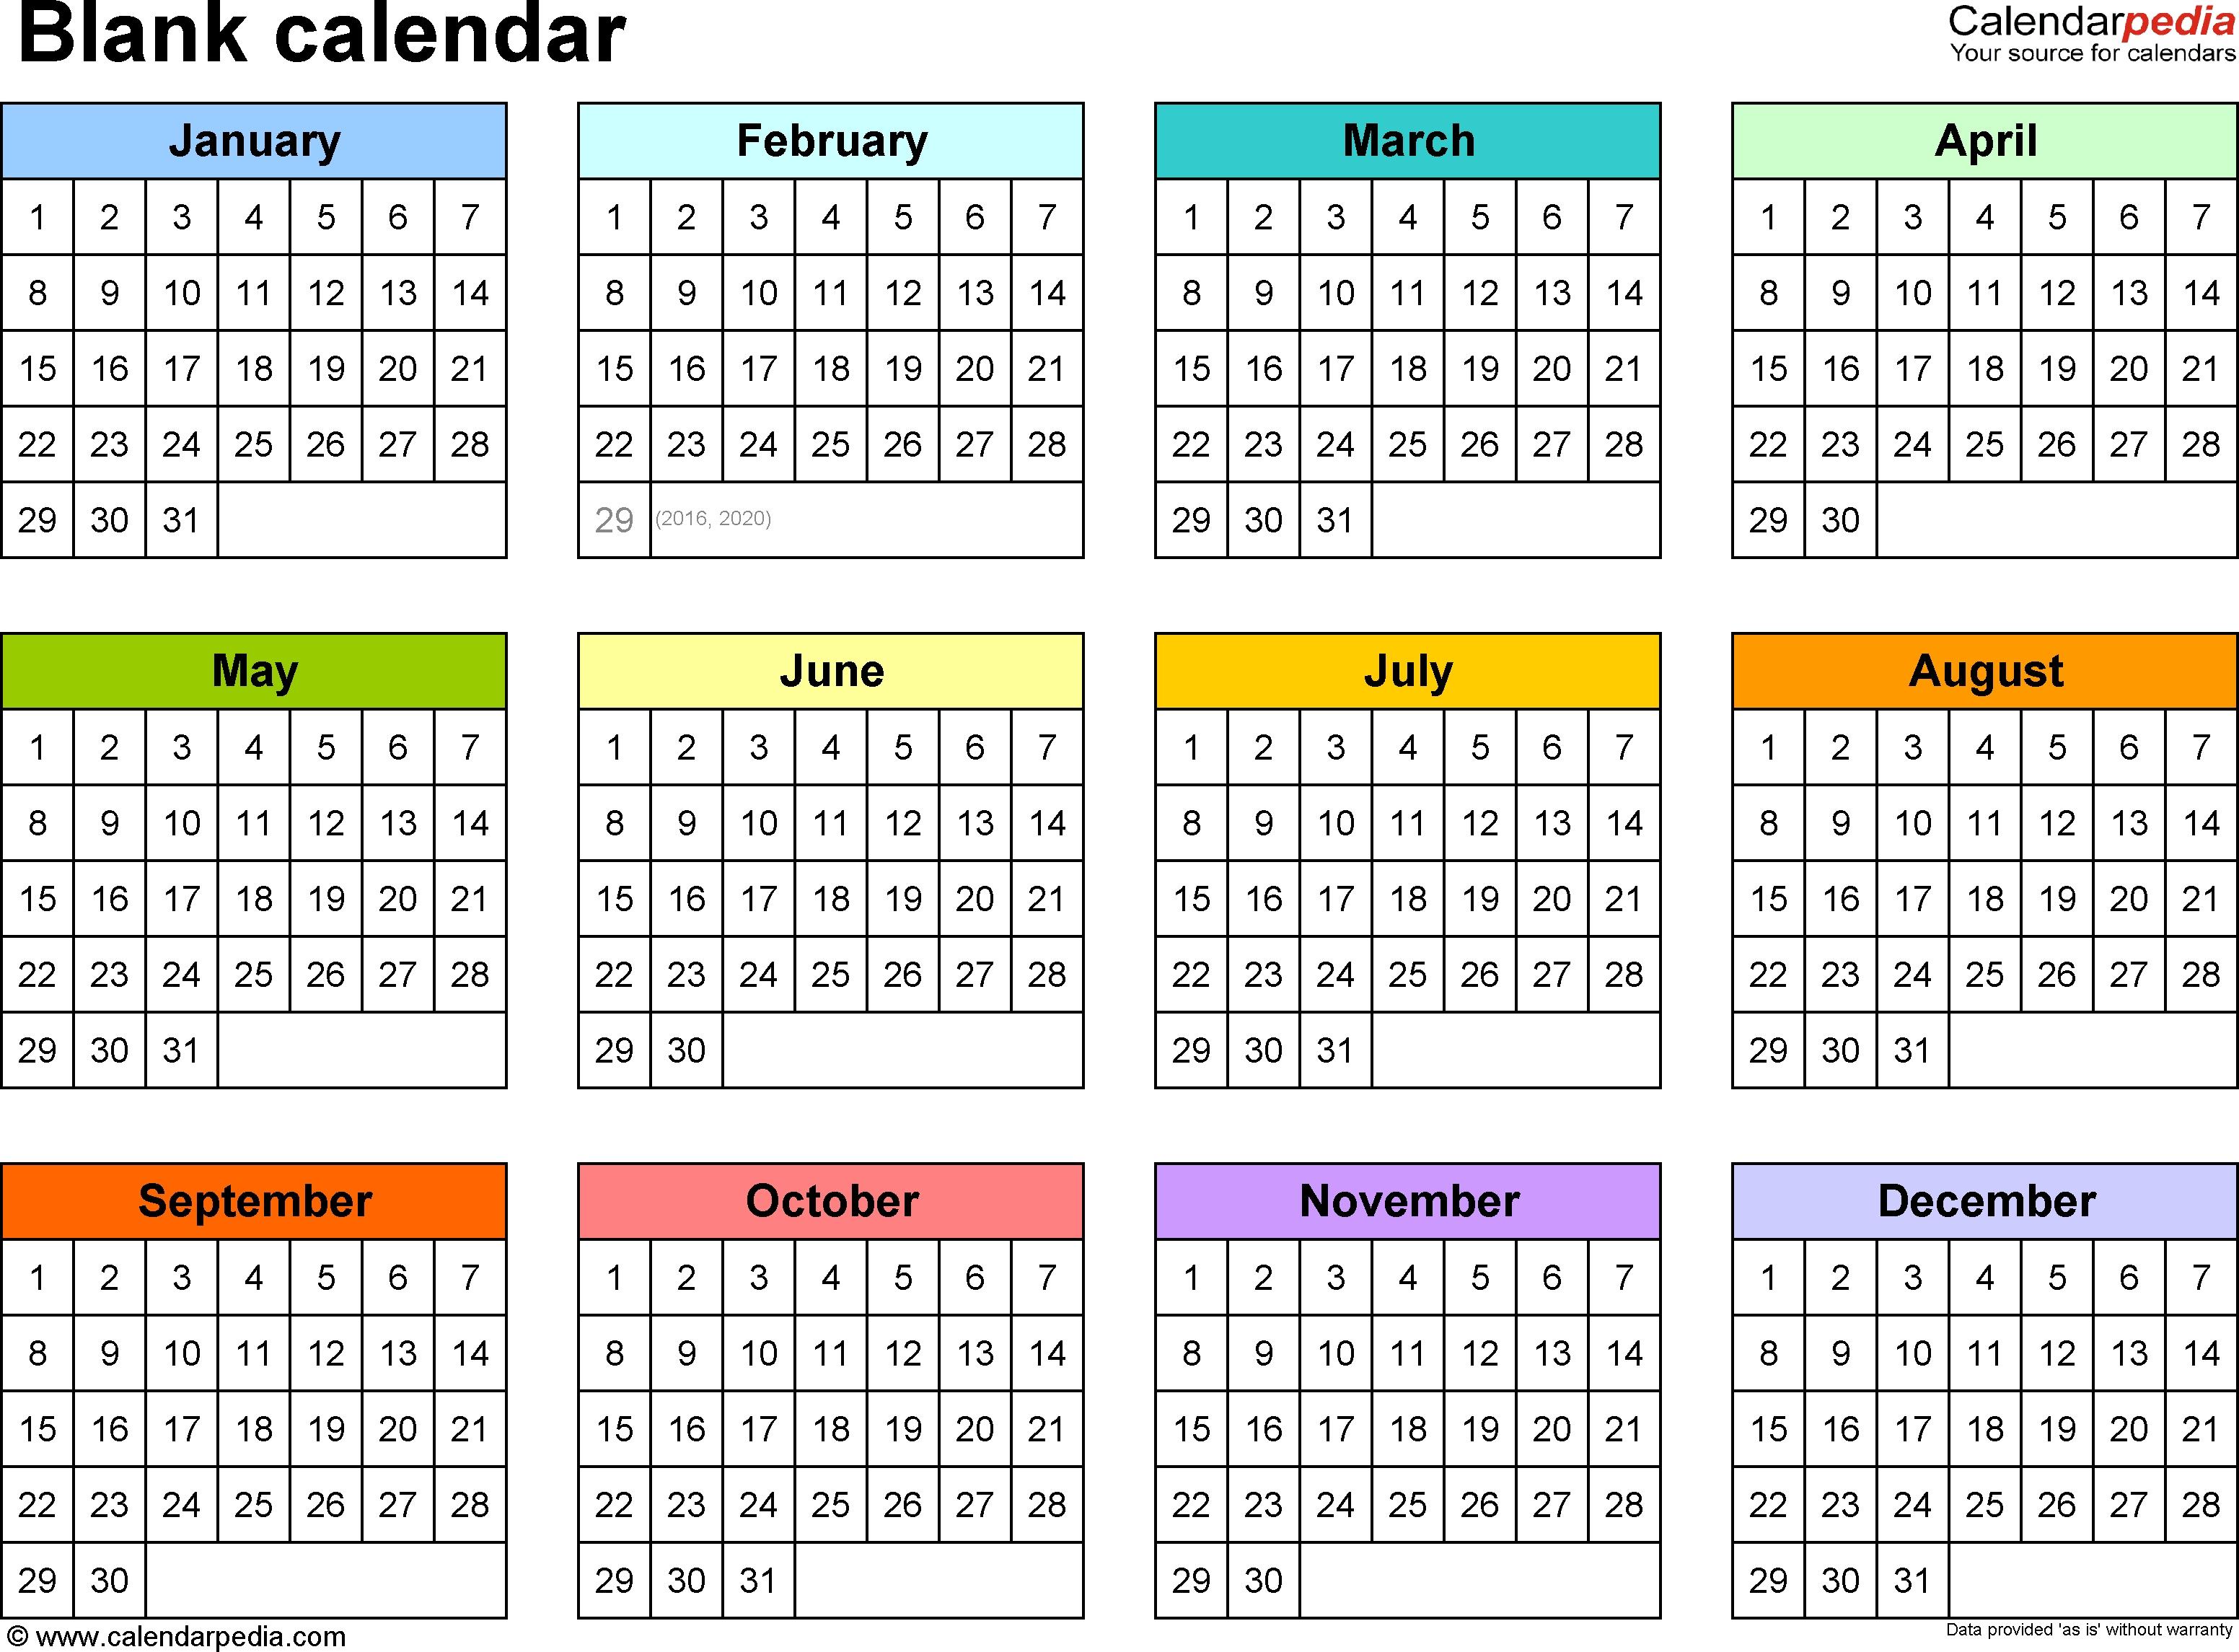 Blank Calendar - 9 Free Printable Microsoft Word Templates inside 1 Page Year Long Calendar Printable Free